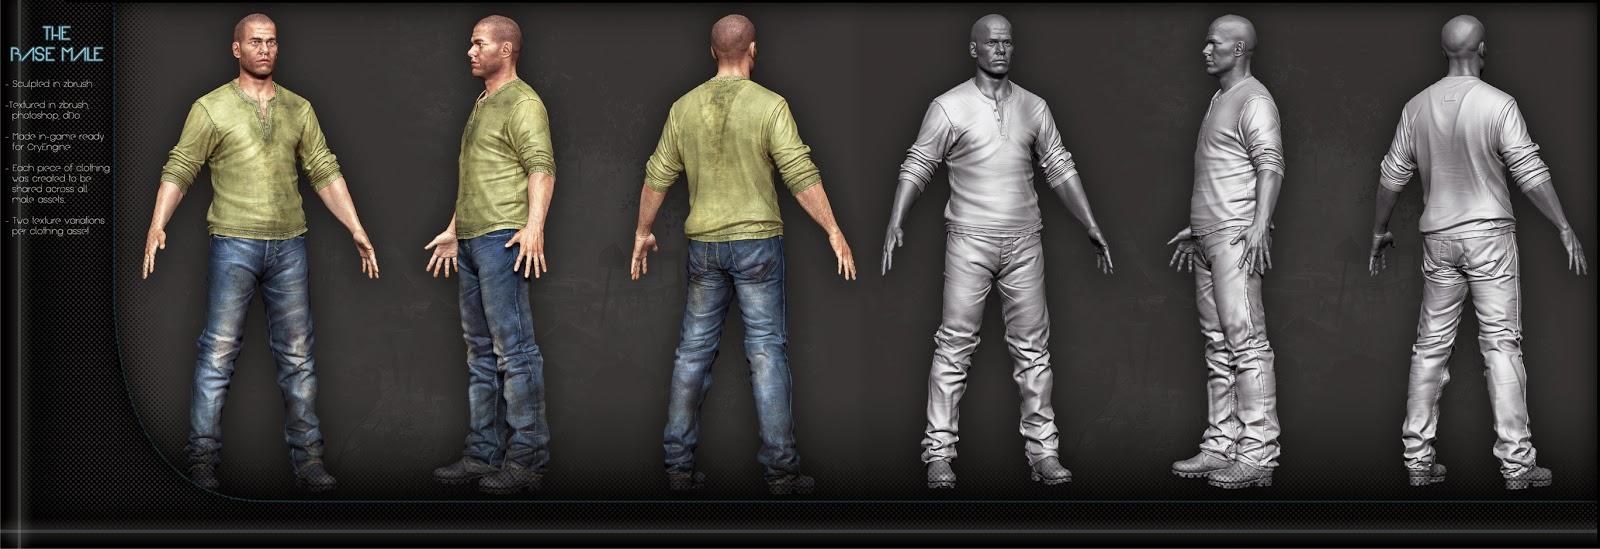 Male Clothing Designer Game Base Male Base nude body and